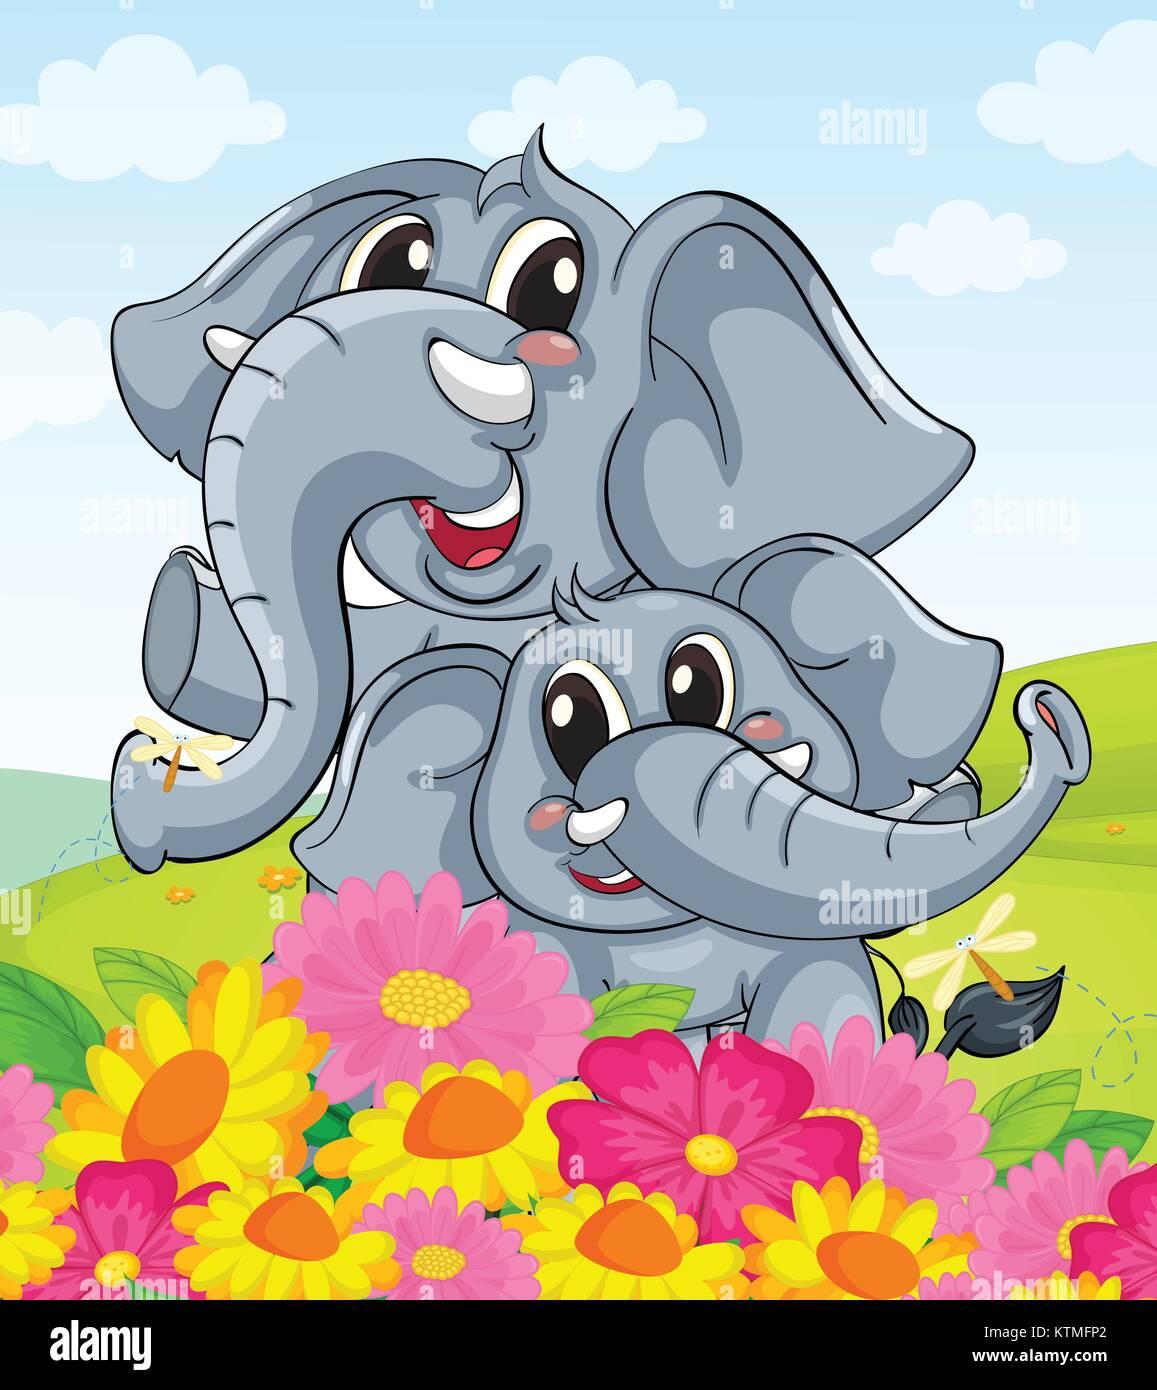 Illustration of cartoon elephants together - Stock Vector